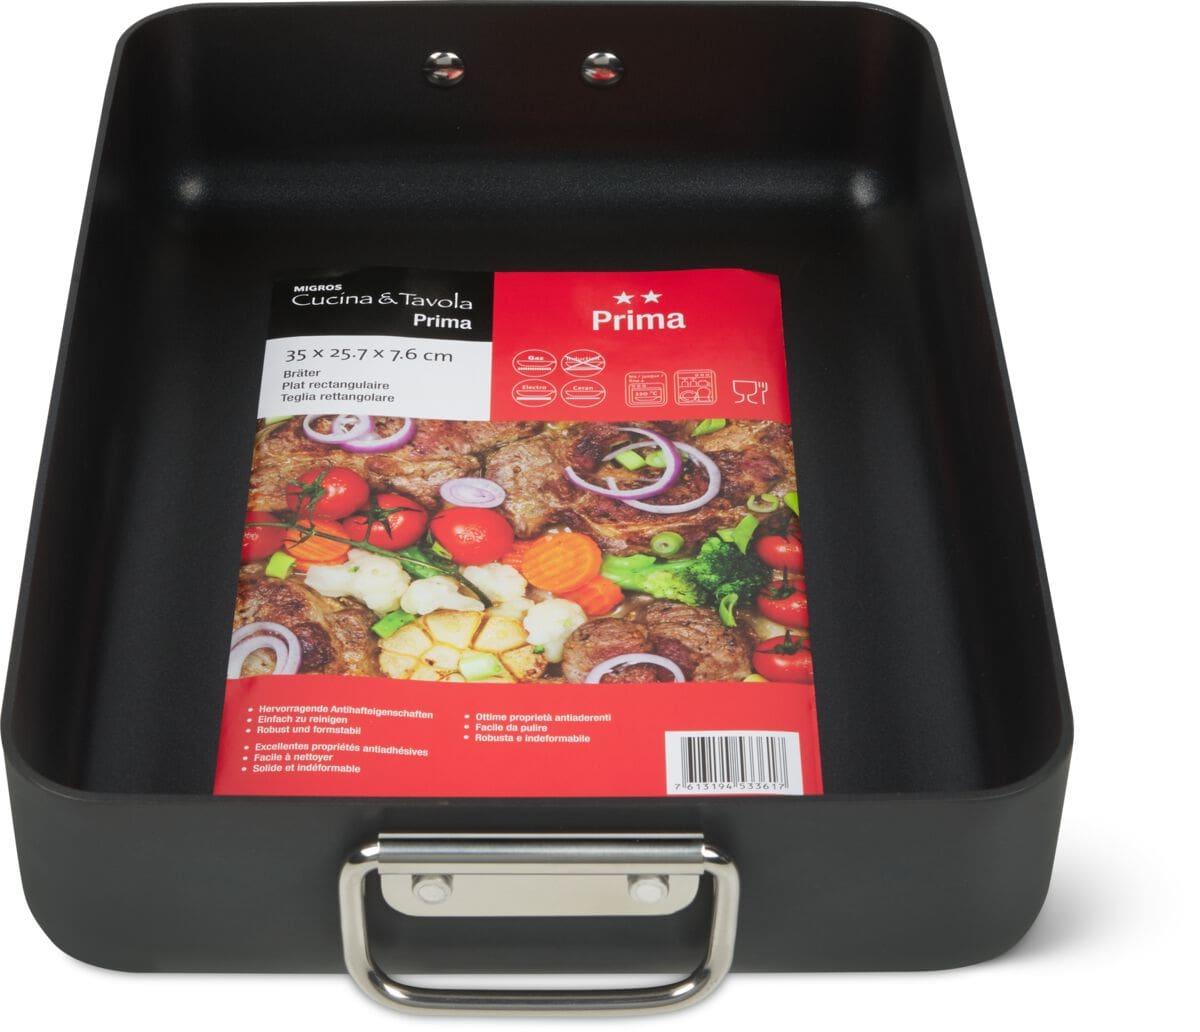 Cucina & Tavola PRIMA Bräter